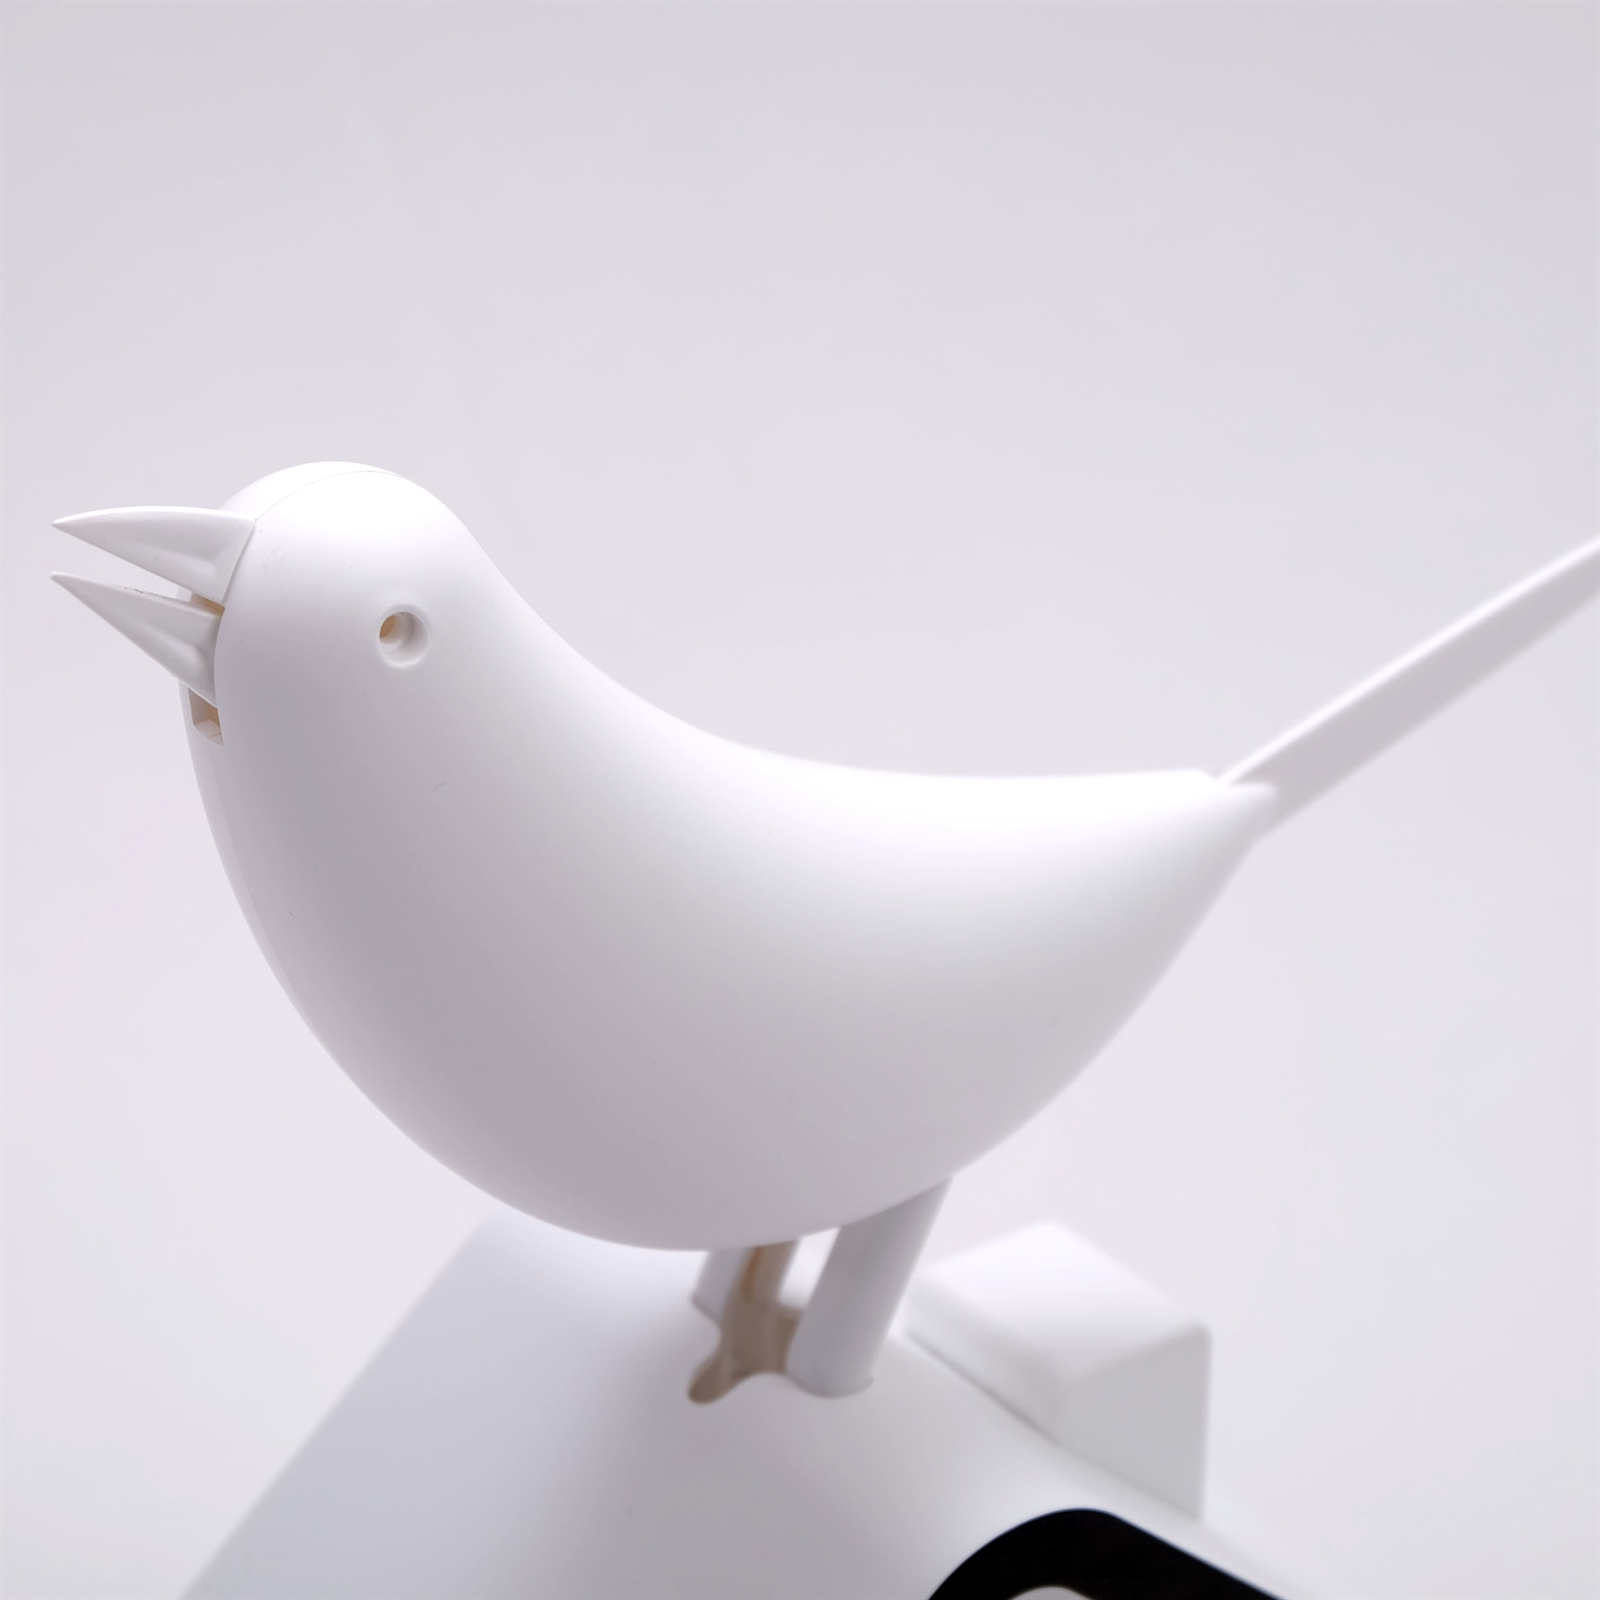 design wanduhr bird wei kare design 38842 30 cm kuckucksuhr eur 39 95 picclick de. Black Bedroom Furniture Sets. Home Design Ideas